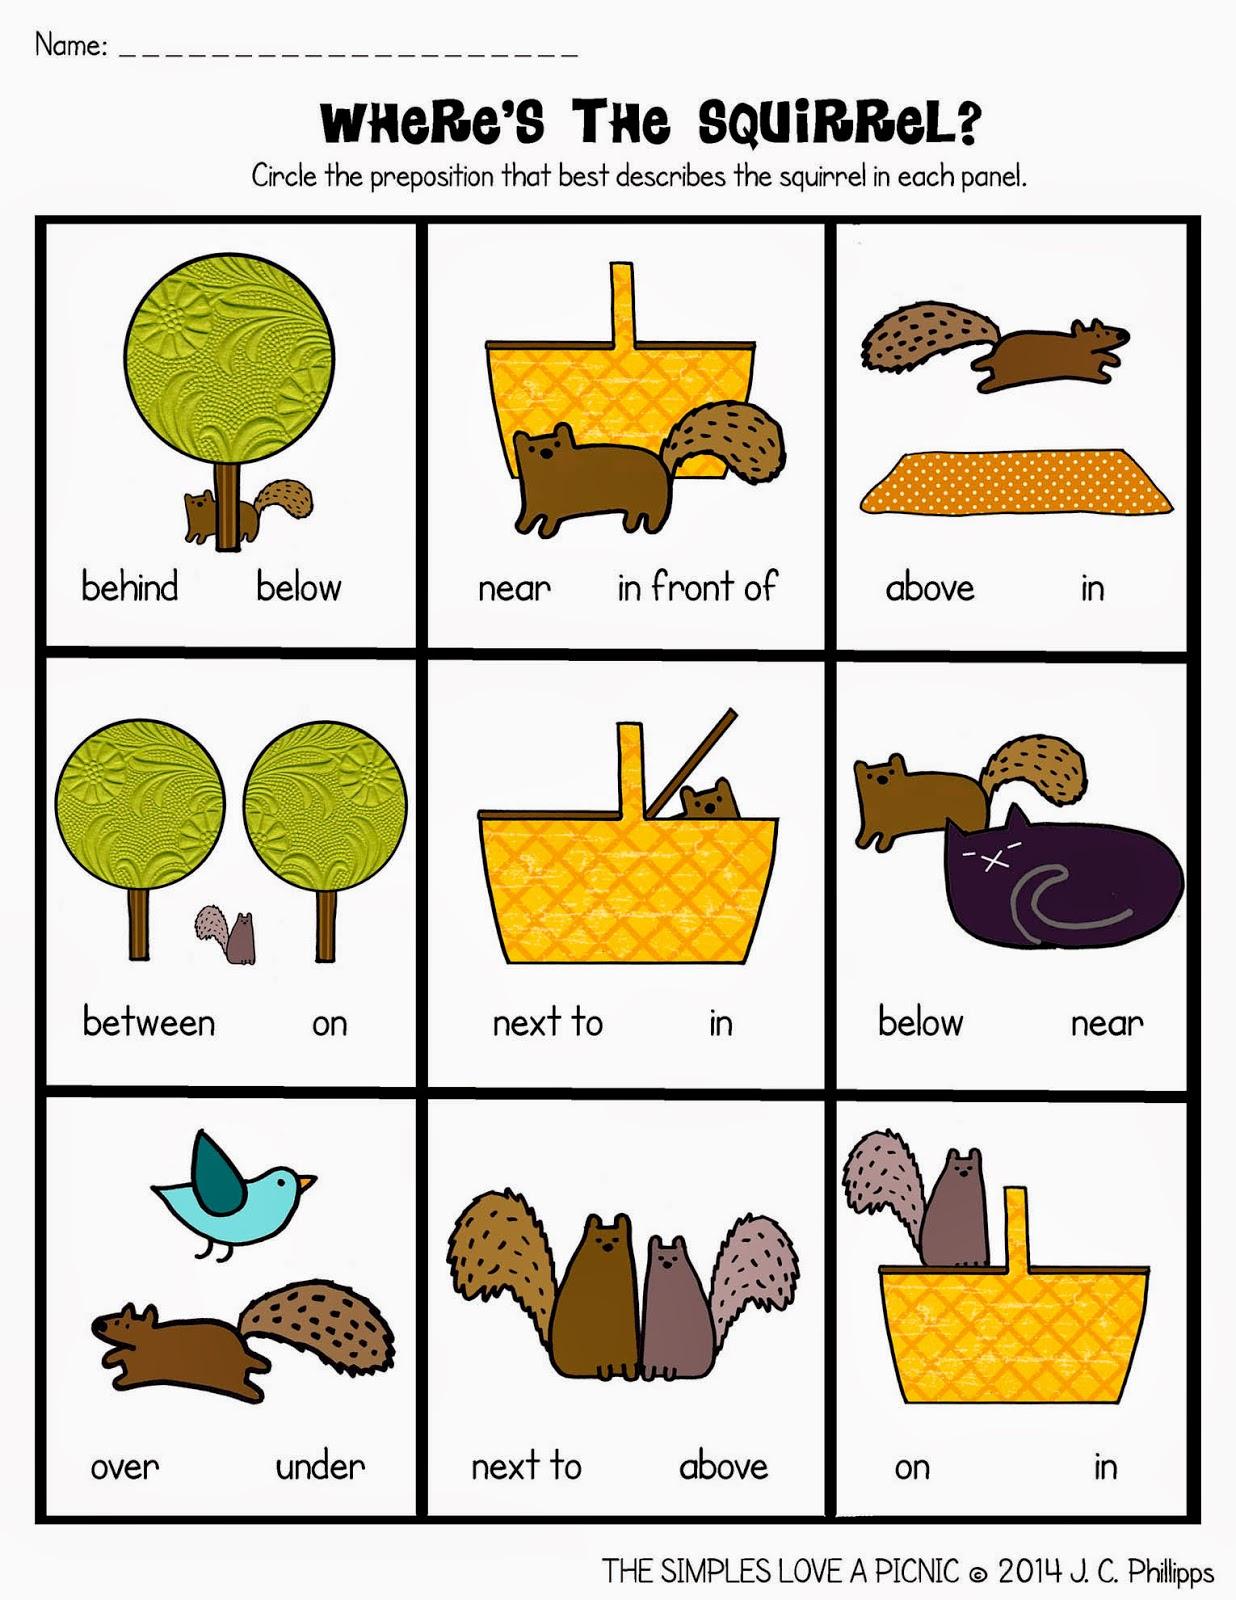 12 Prepositions Worksheets Pdf Kindergarten, Kindergarten Worksheets | Free Printable Preposition Worksheets For Kindergarten